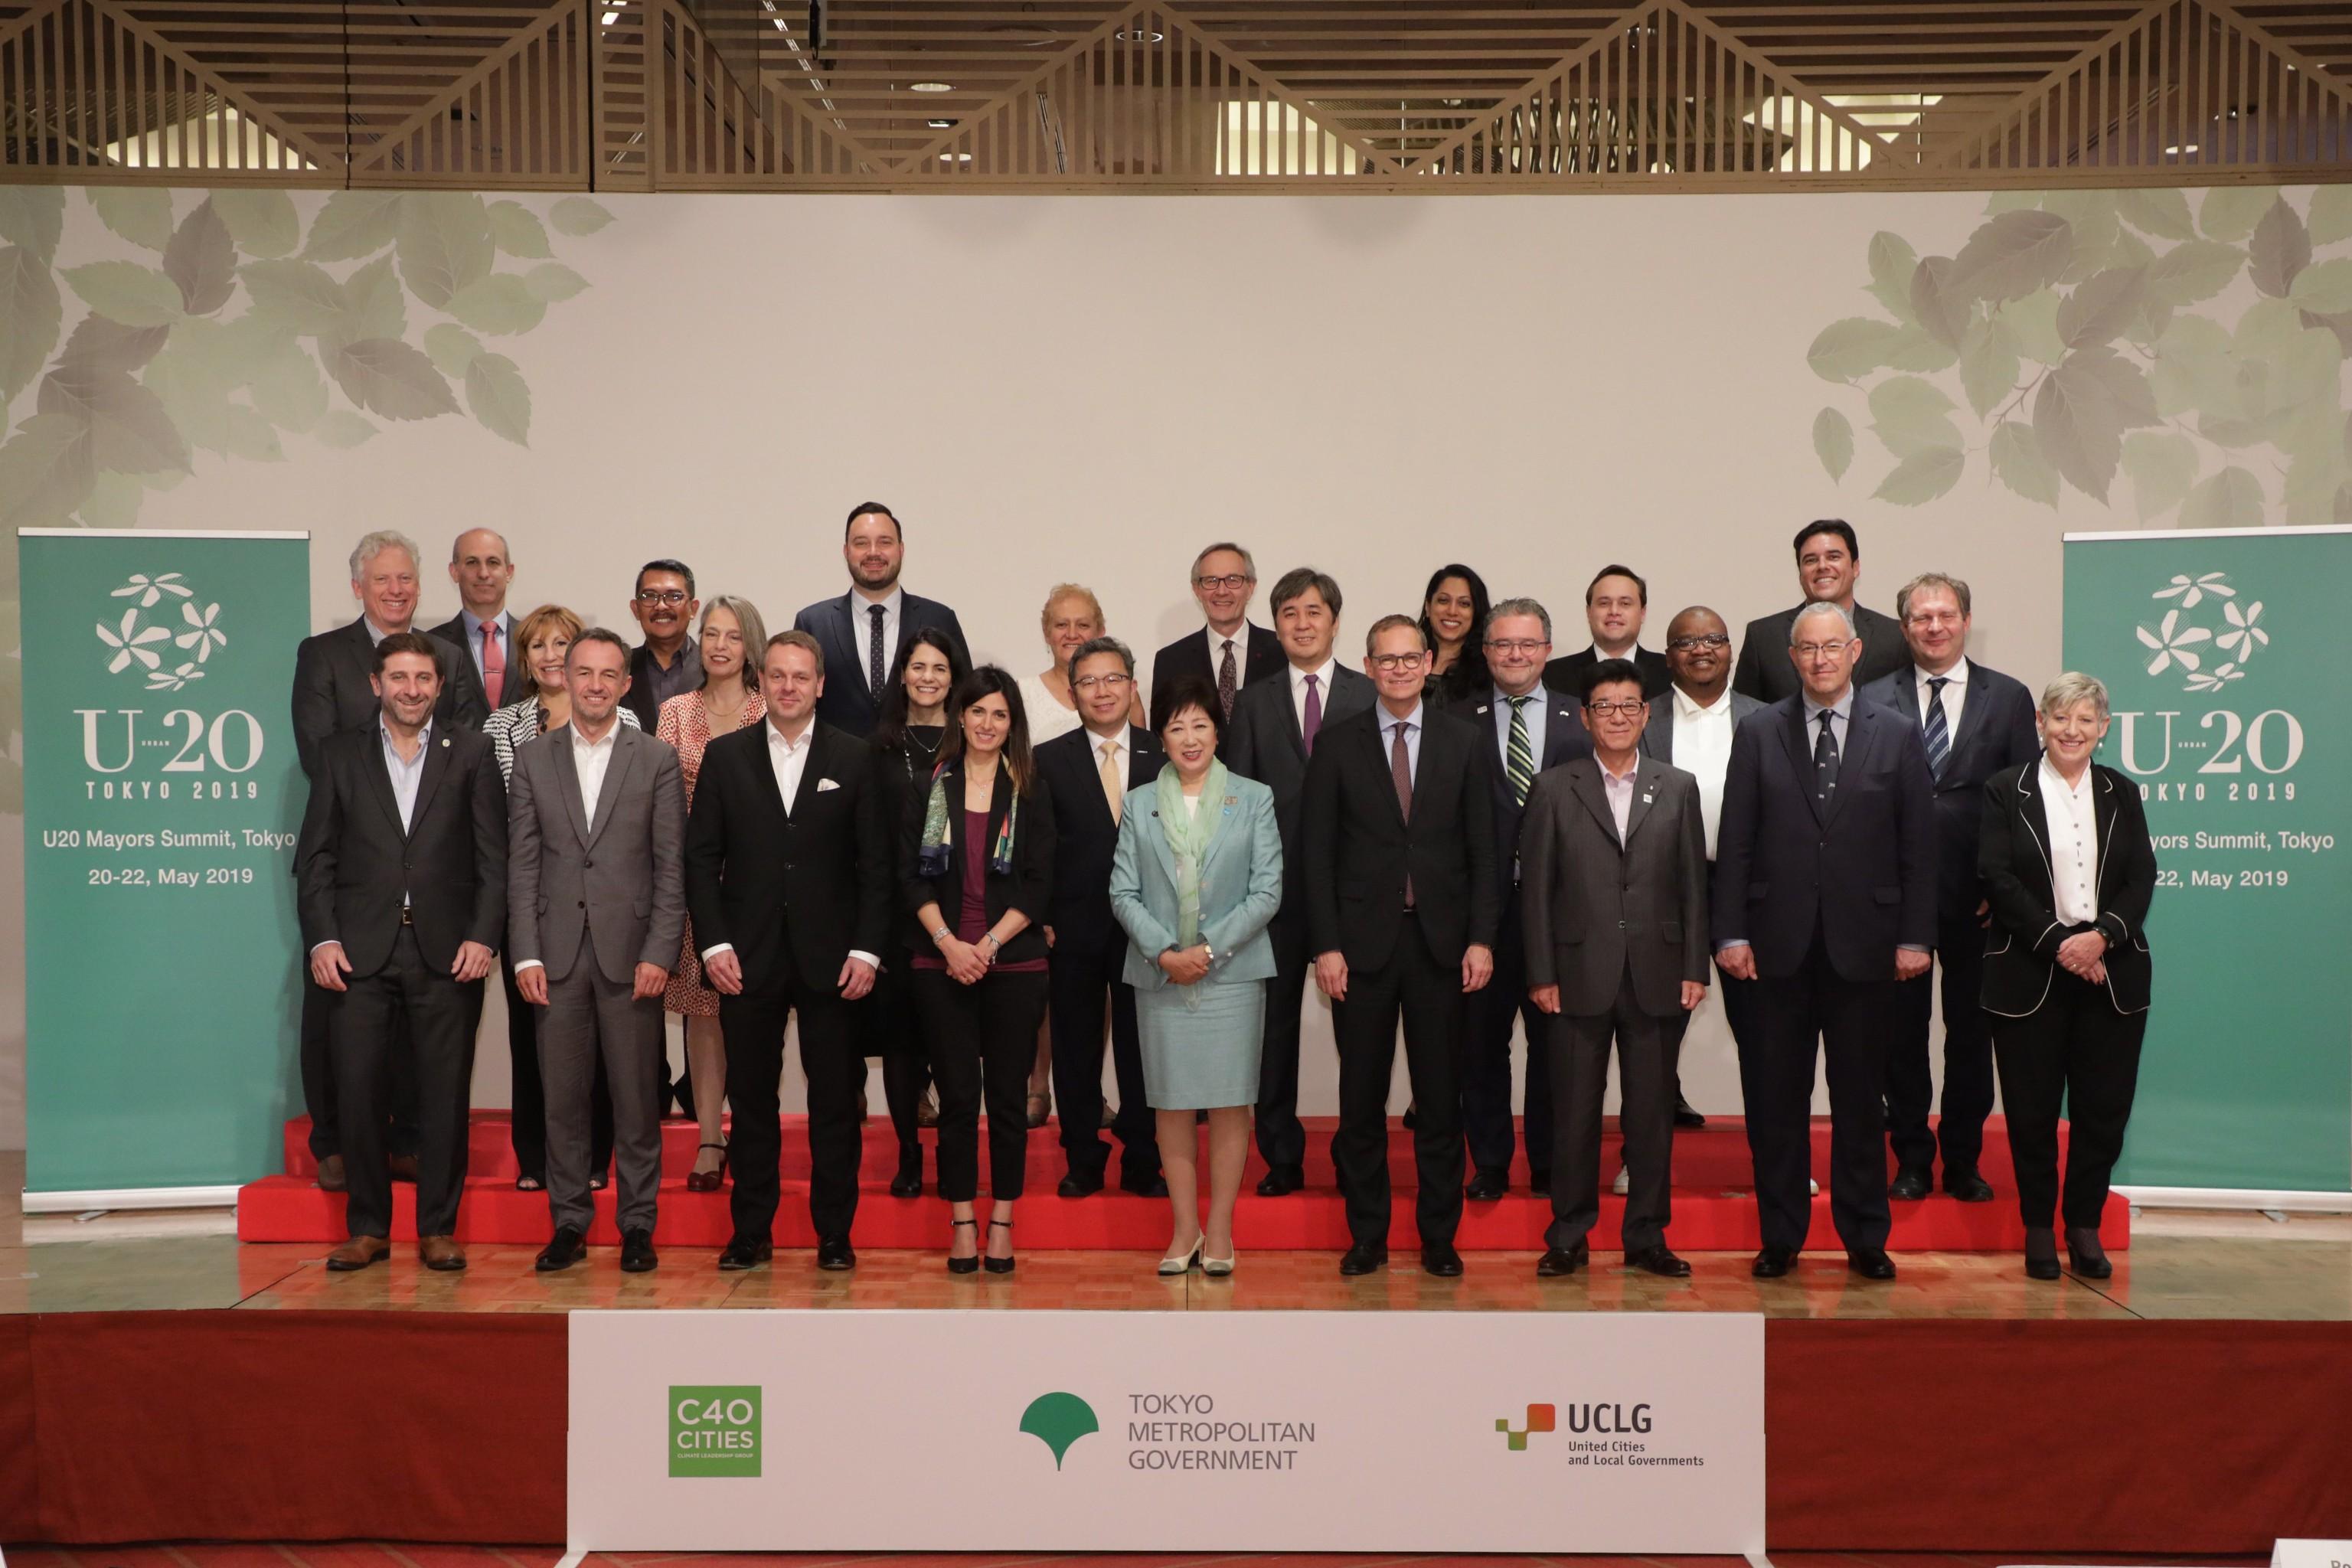 Urban 20 Mayors Summit Tokyo, 20-22 May 2019